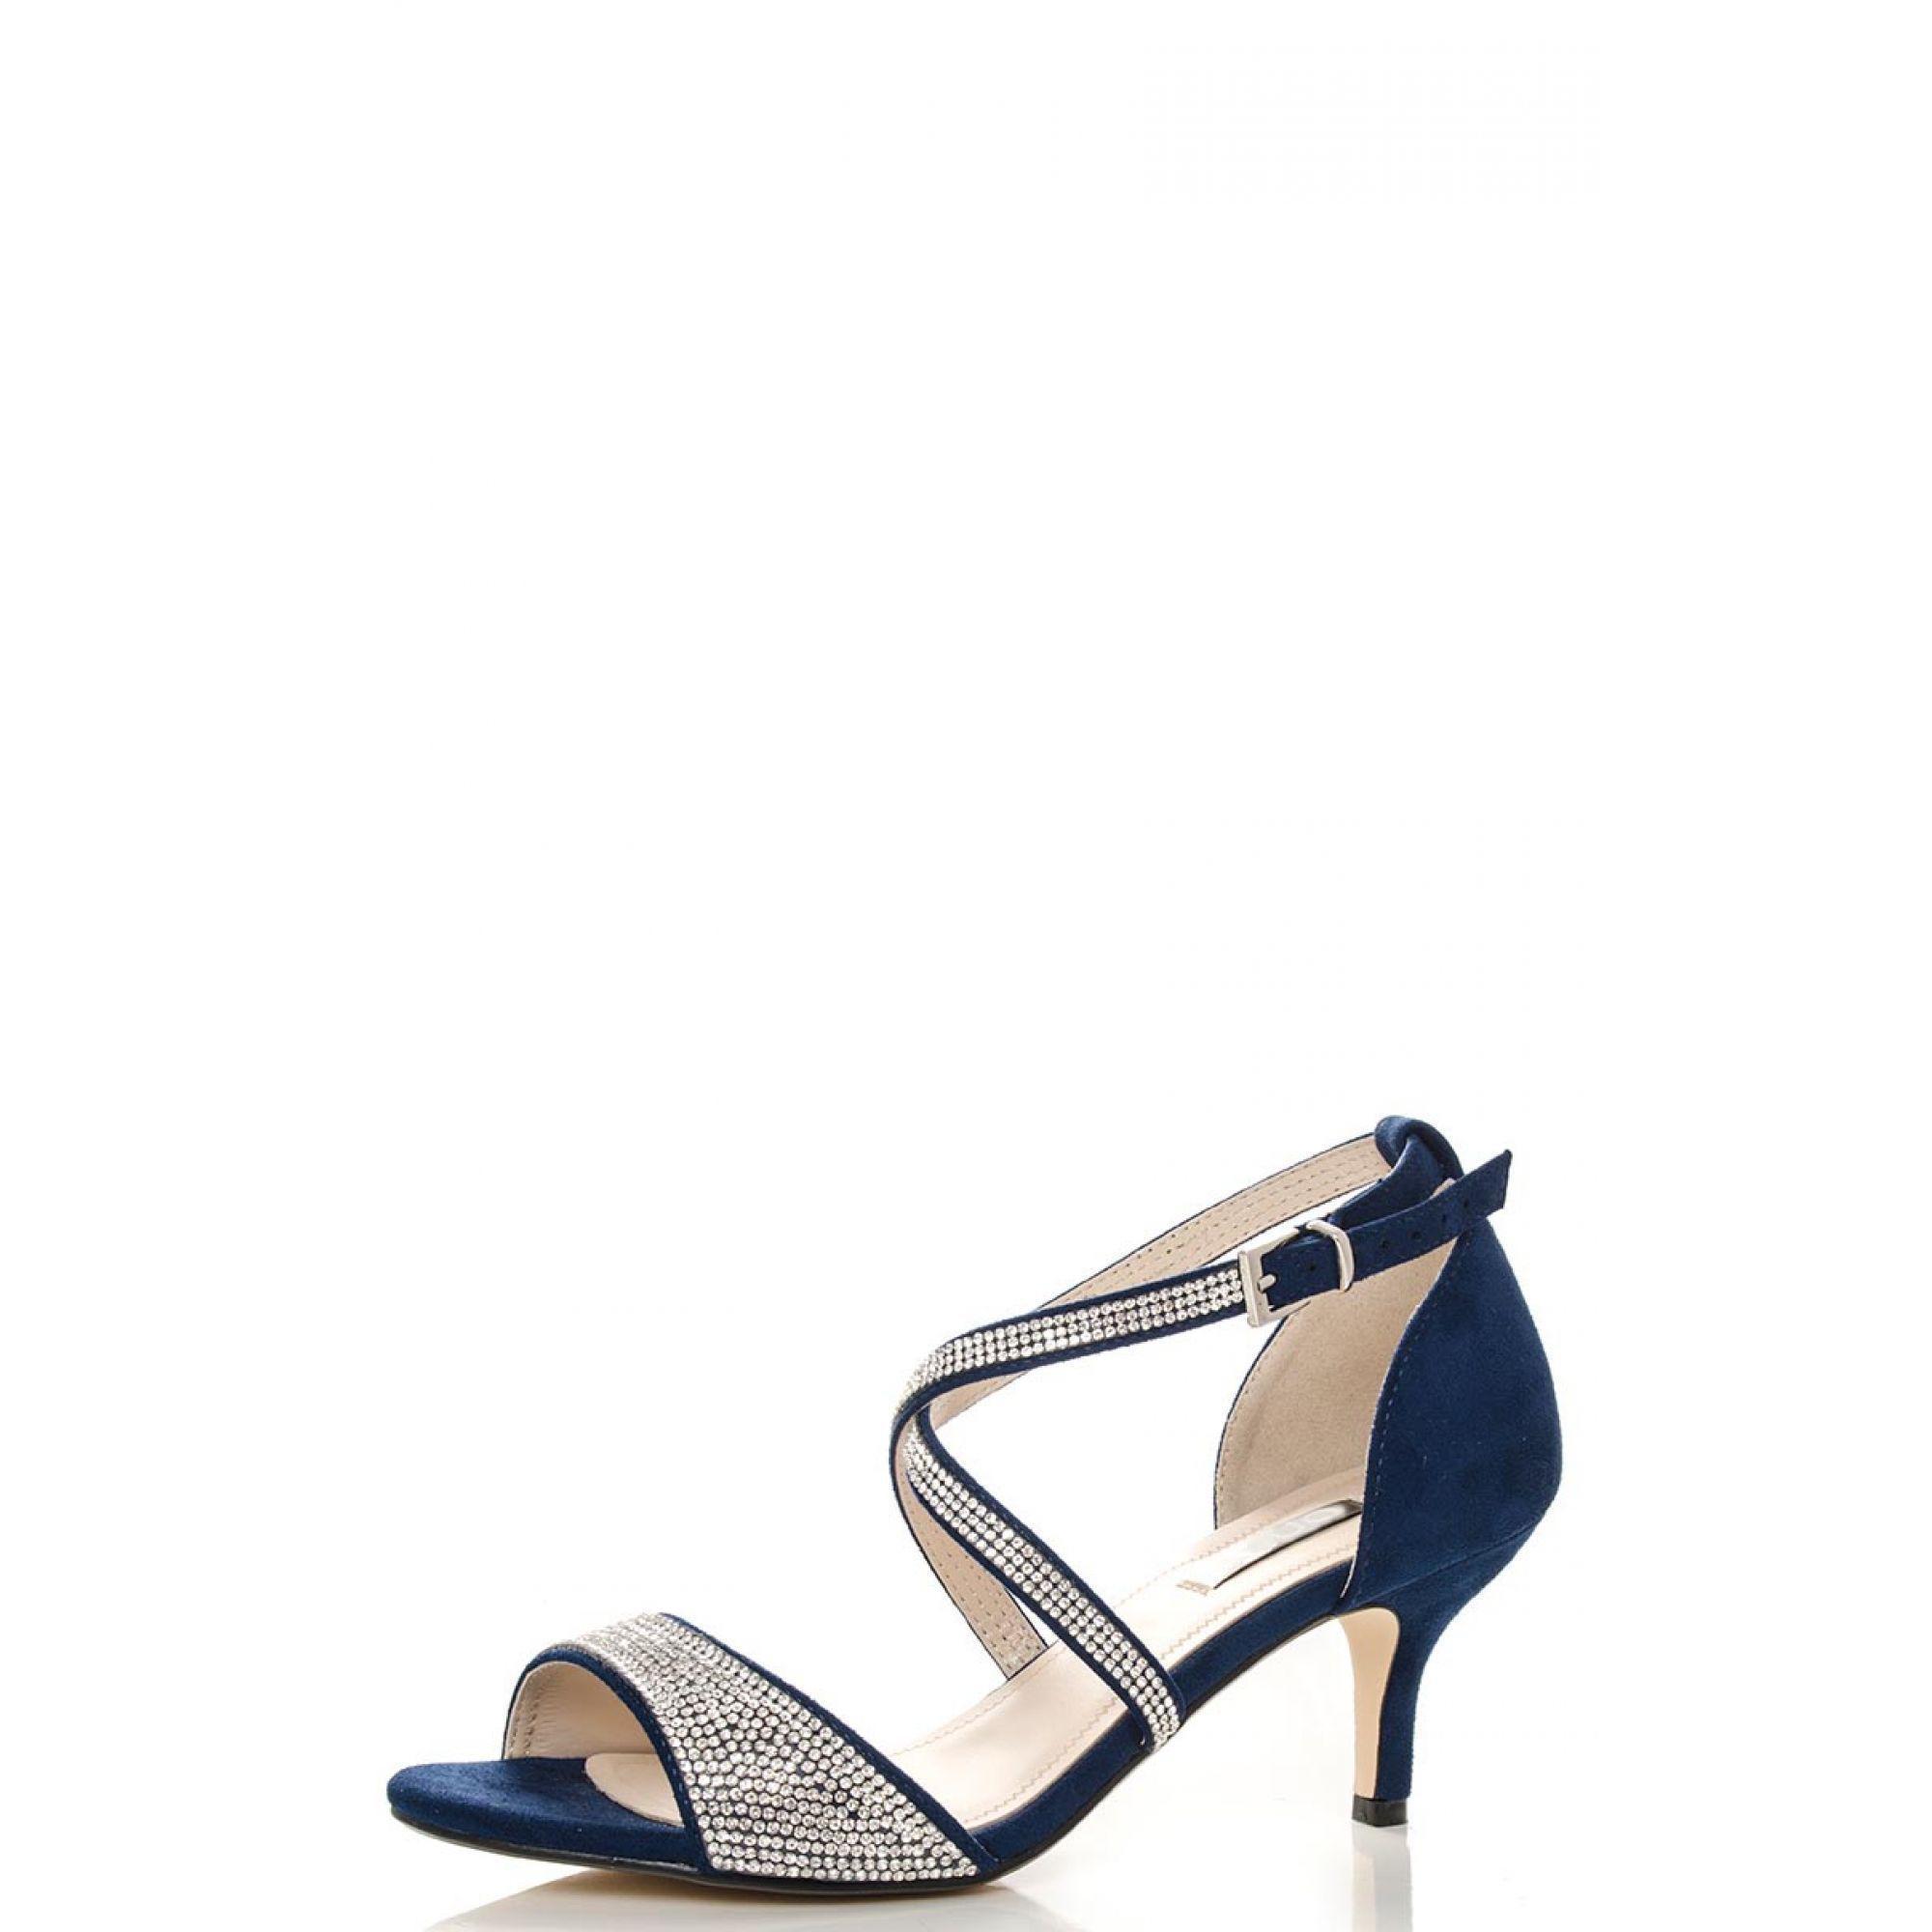 6e57d88359e3f Quiz Navy Diamante Low Heel Sandals in Blue - Lyst